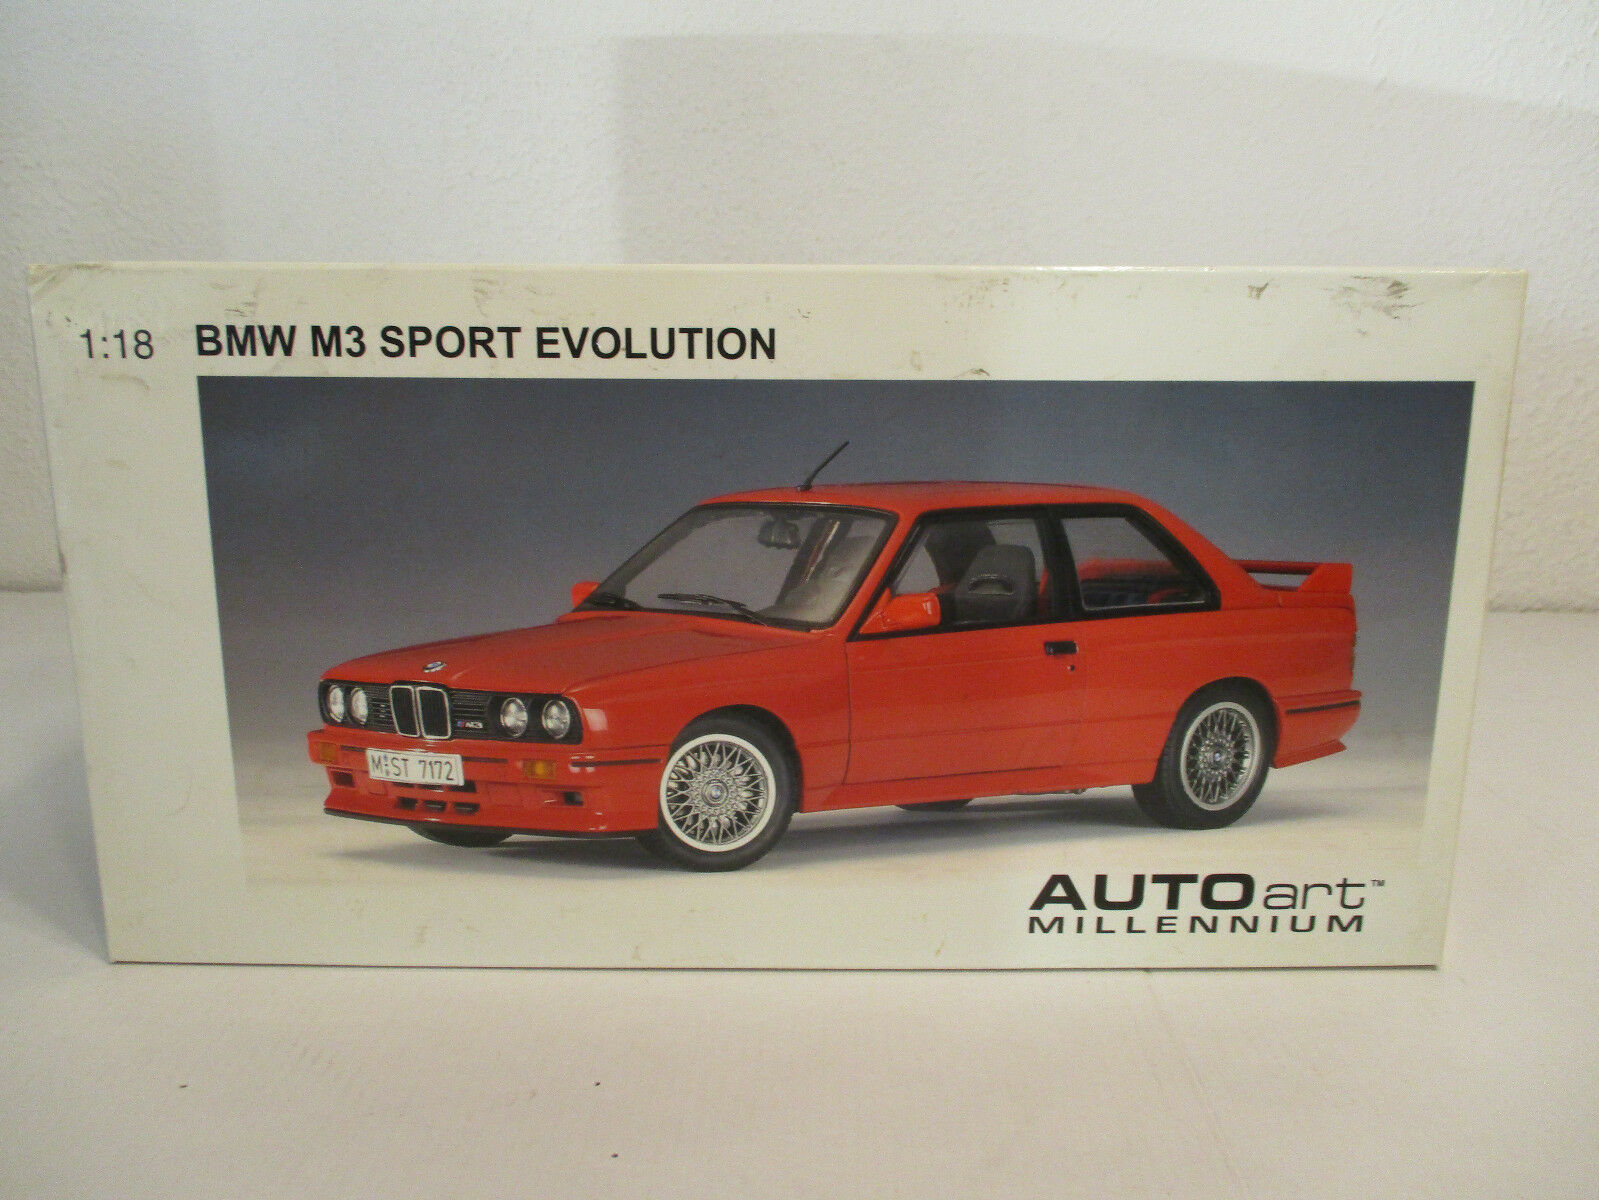 (Modelage) 1:18 Autoart BMW M 3 3 3 Sport Evolution Red Neuf neuf dans sa boîte   D'ornement  d422cf